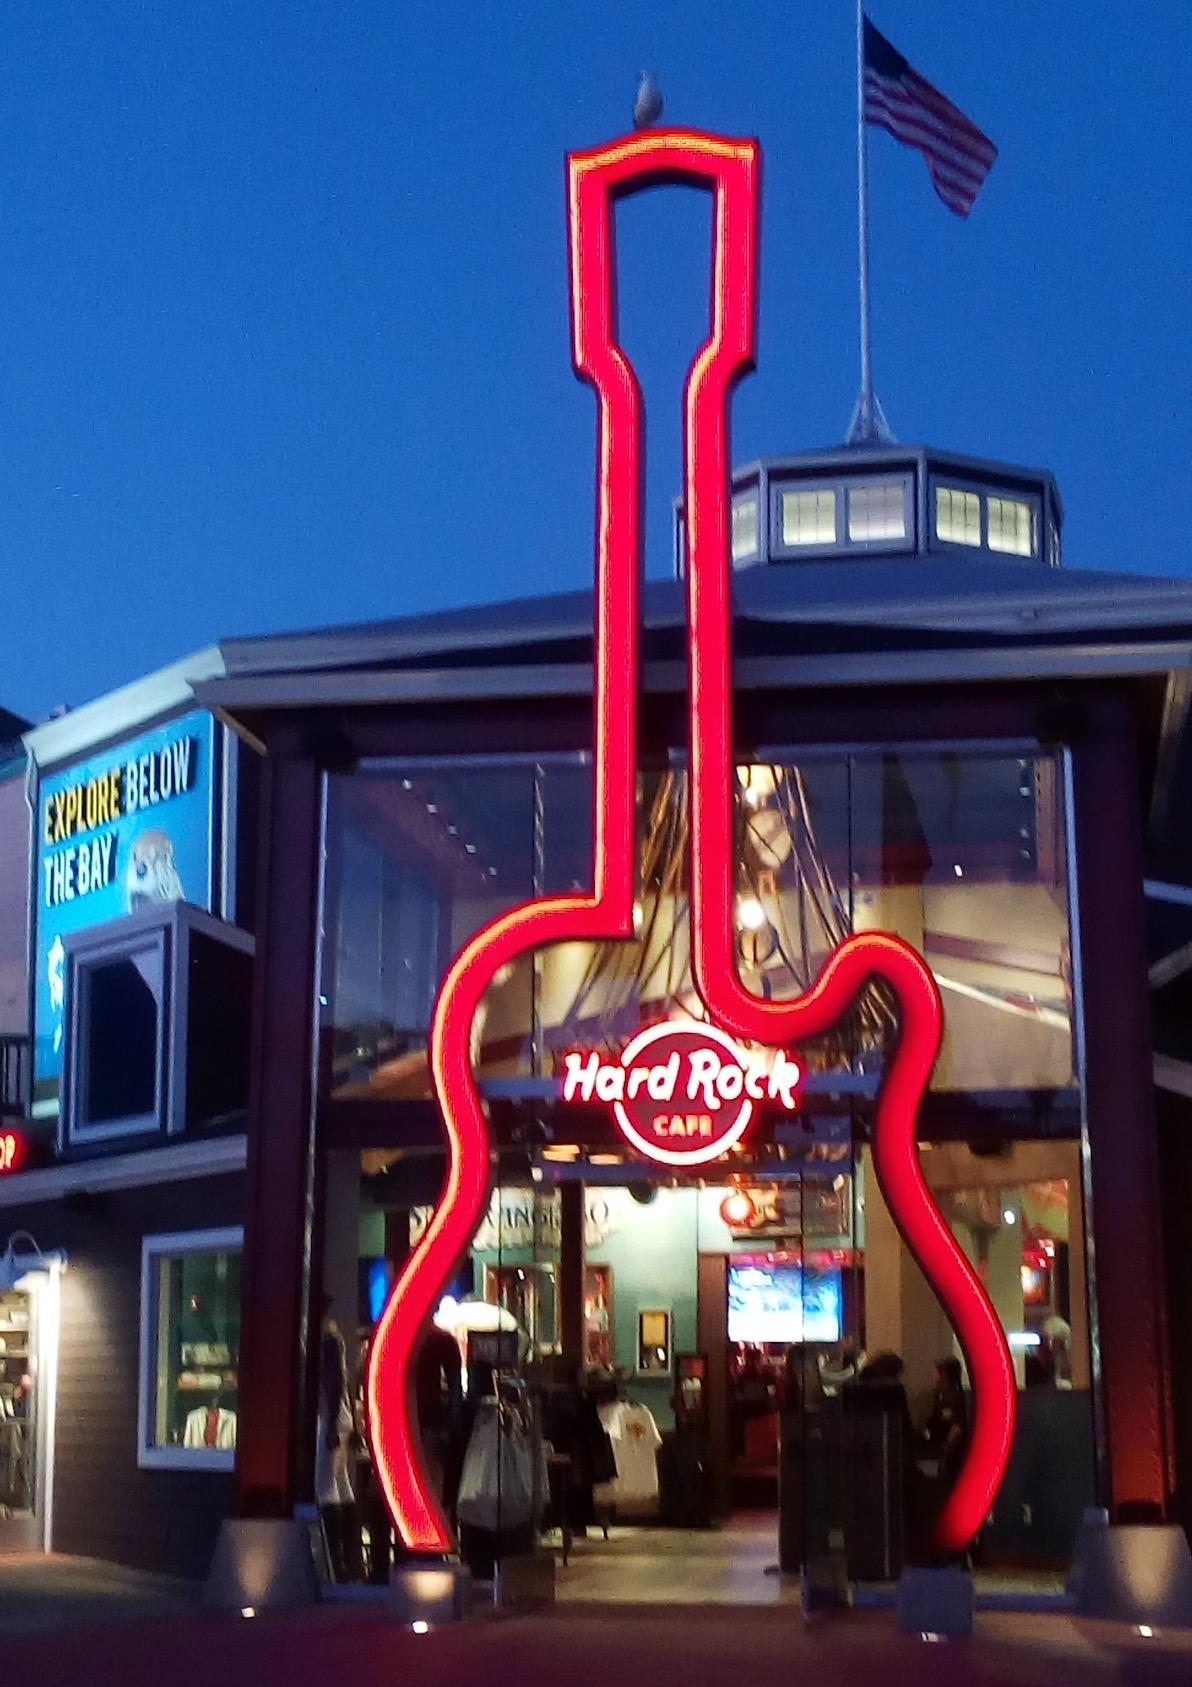 San Francisco Bay Area - Hard Rock Cafe